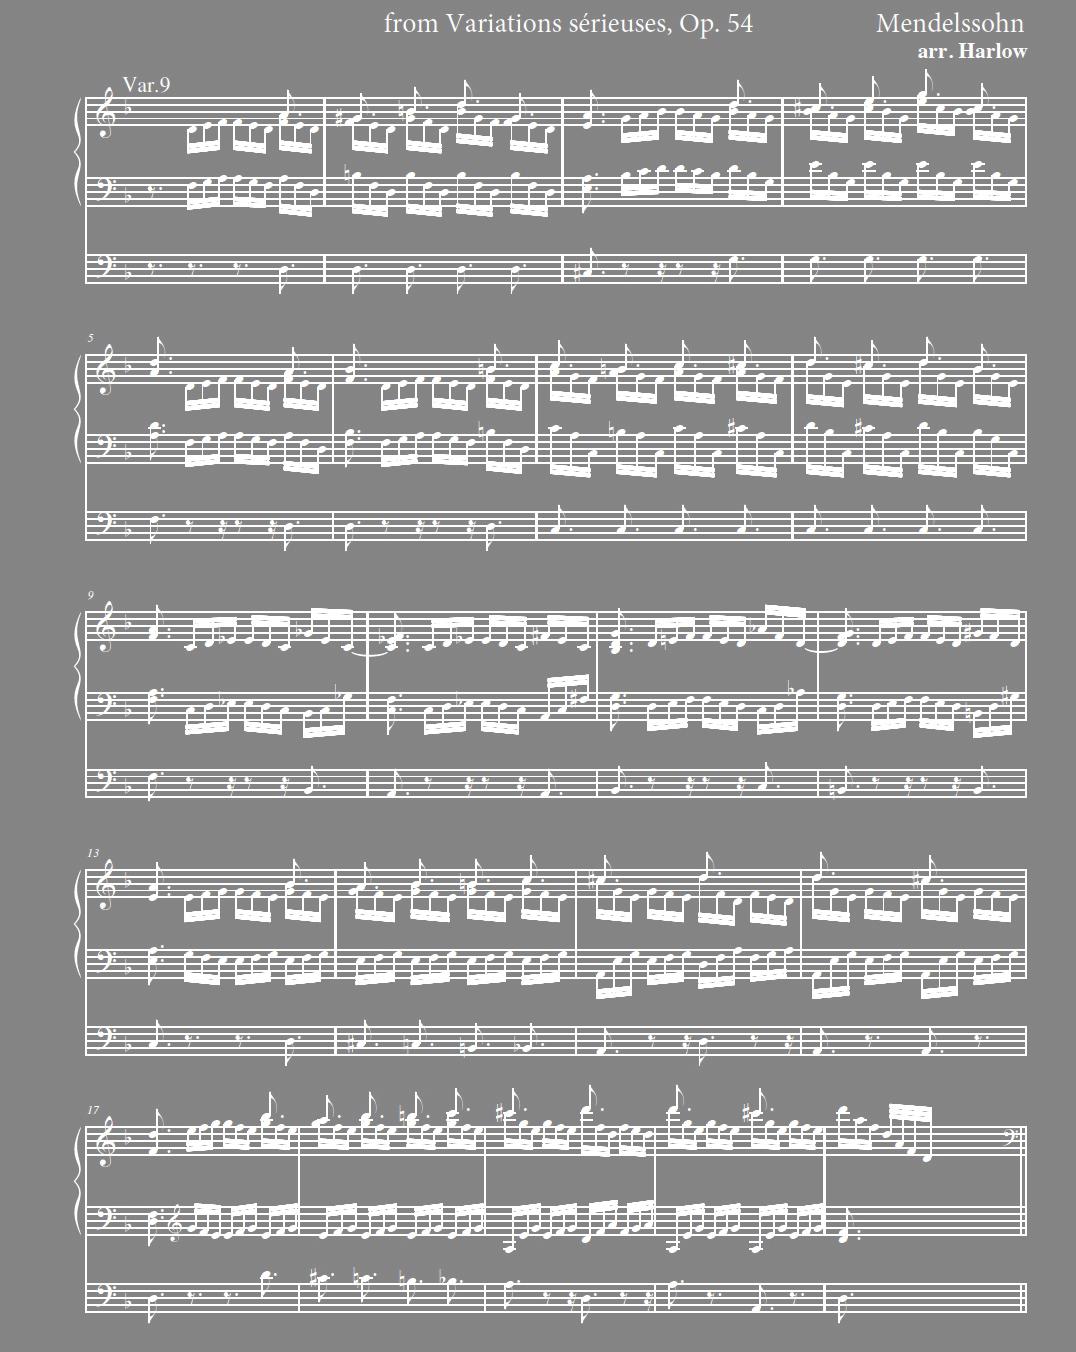 Mendelssohn Variations Serieuses for organ